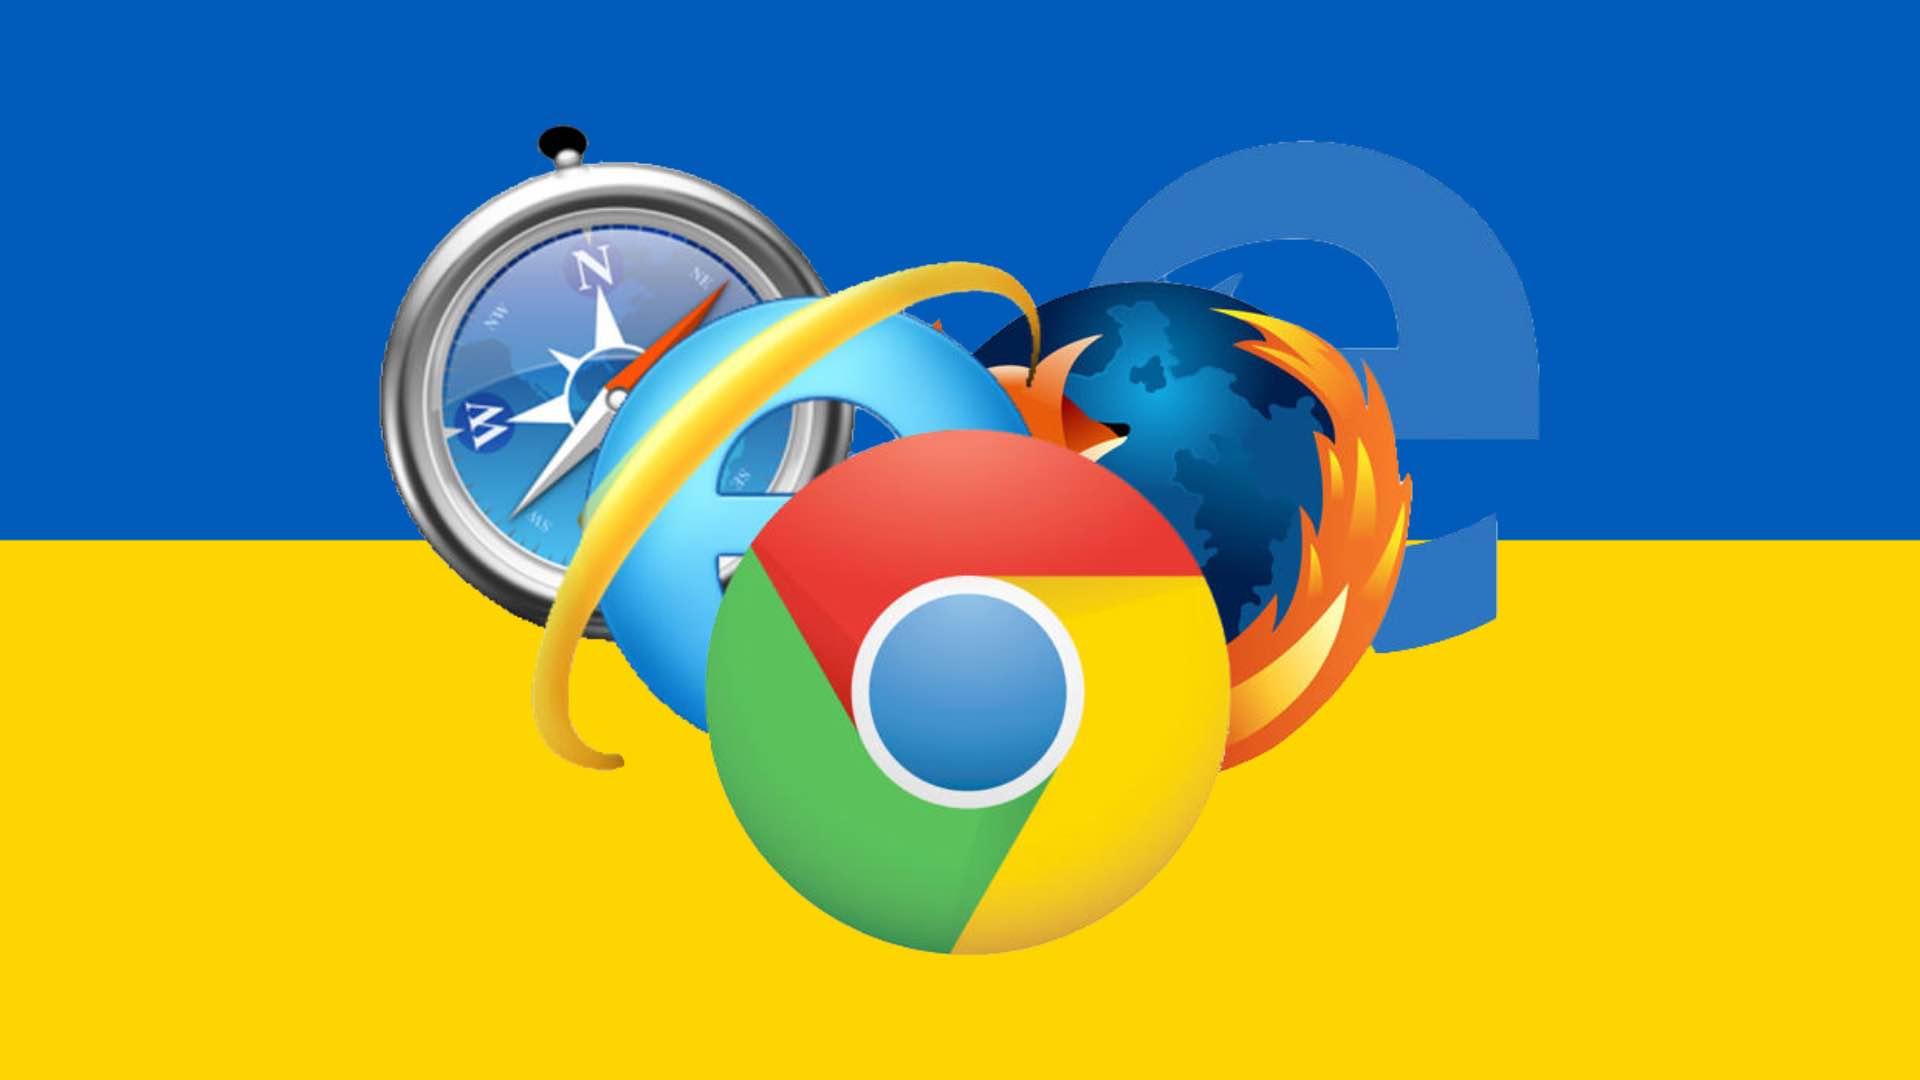 Найпопулярніші браузери